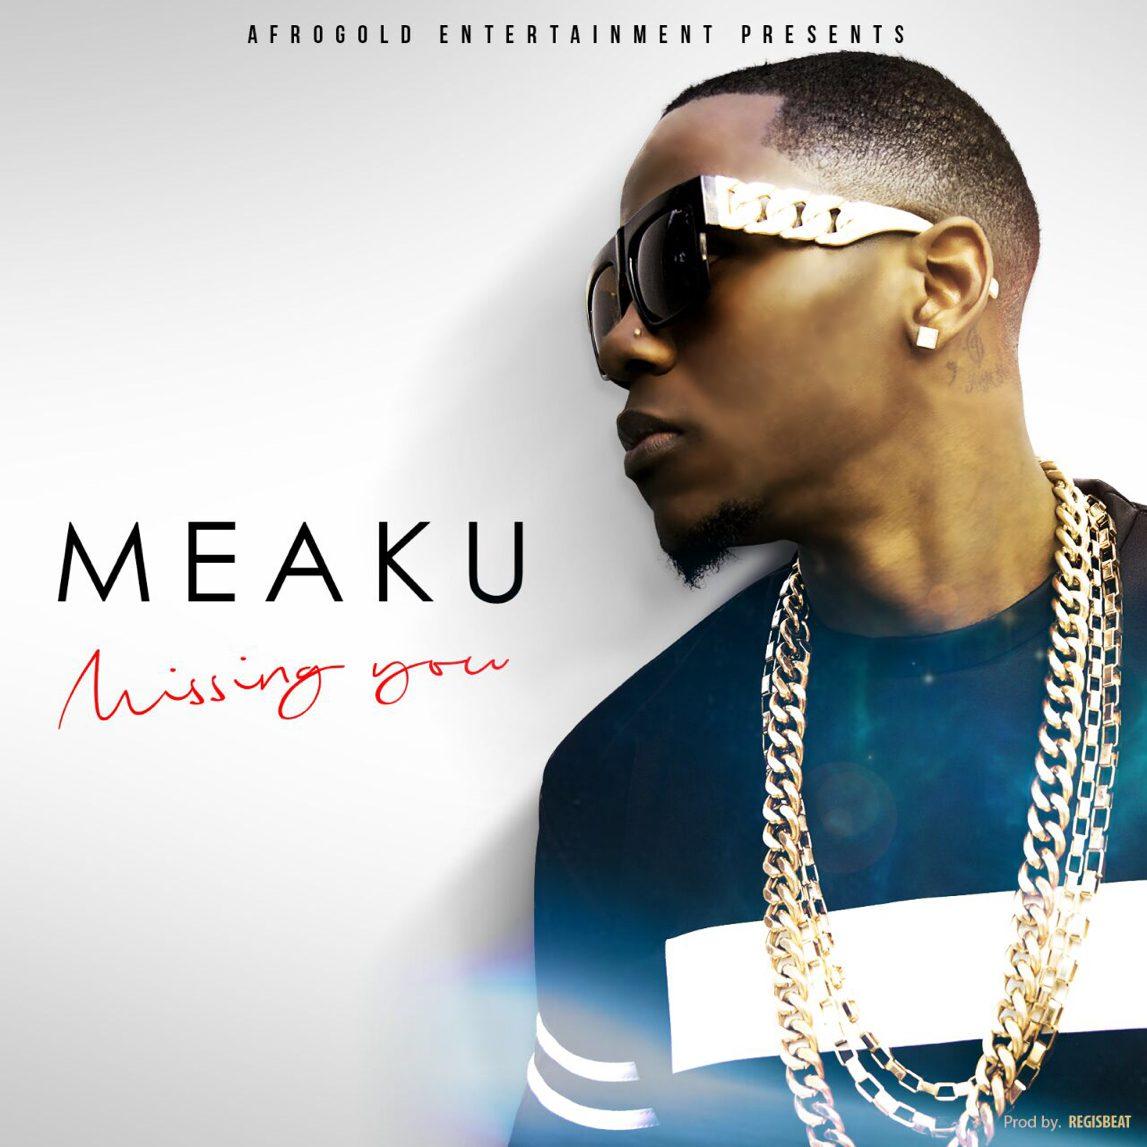 Meaku- Missing You (Artwork)